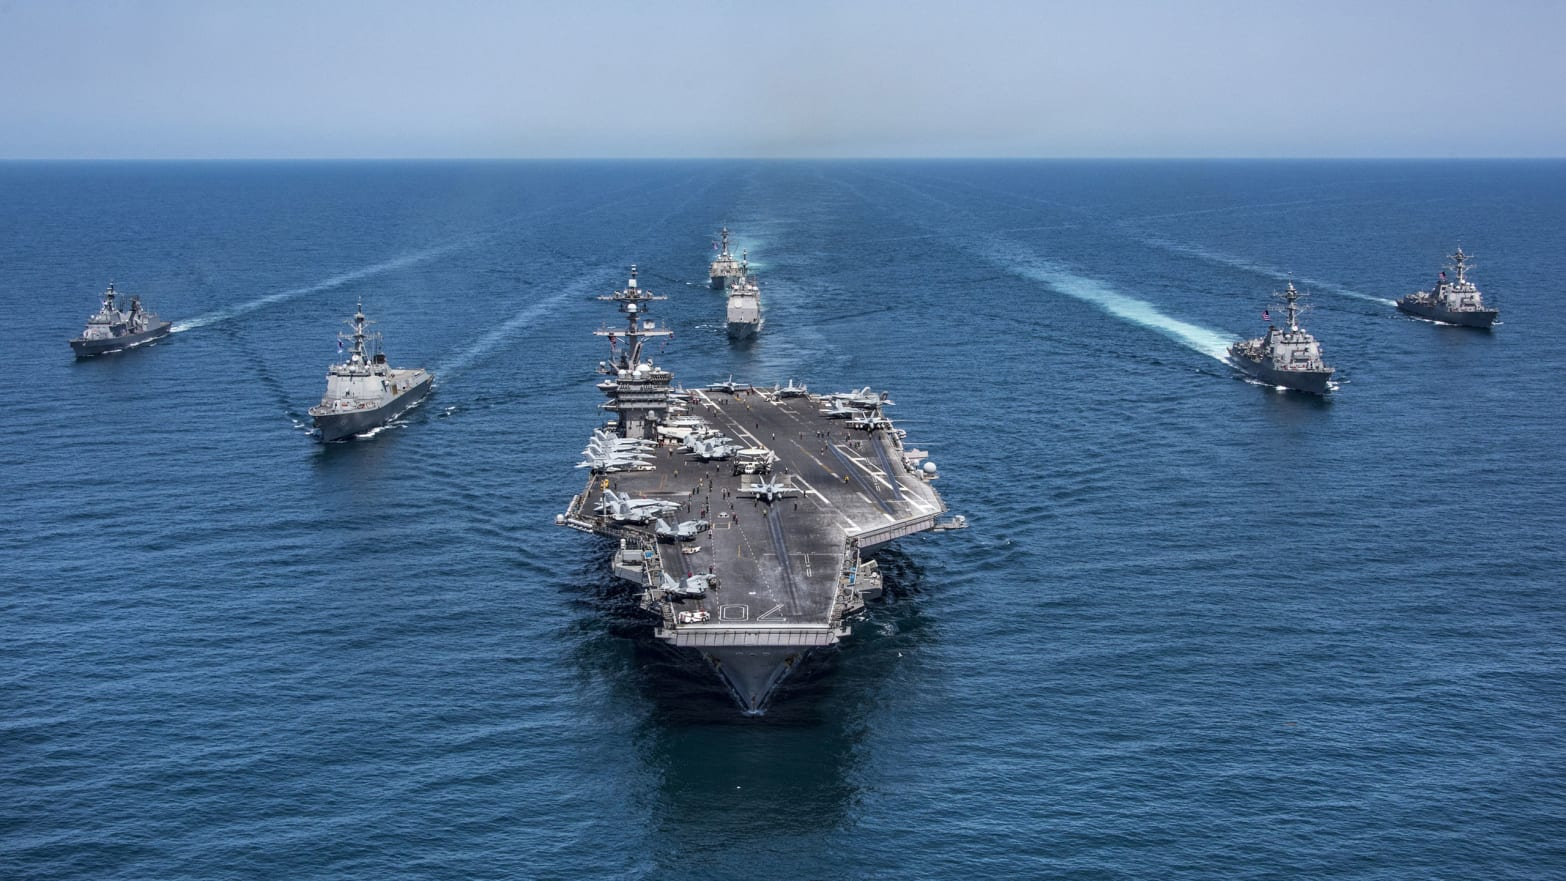 Showdown: U.S. Moving Third Carrier Strike Group Near North Korea